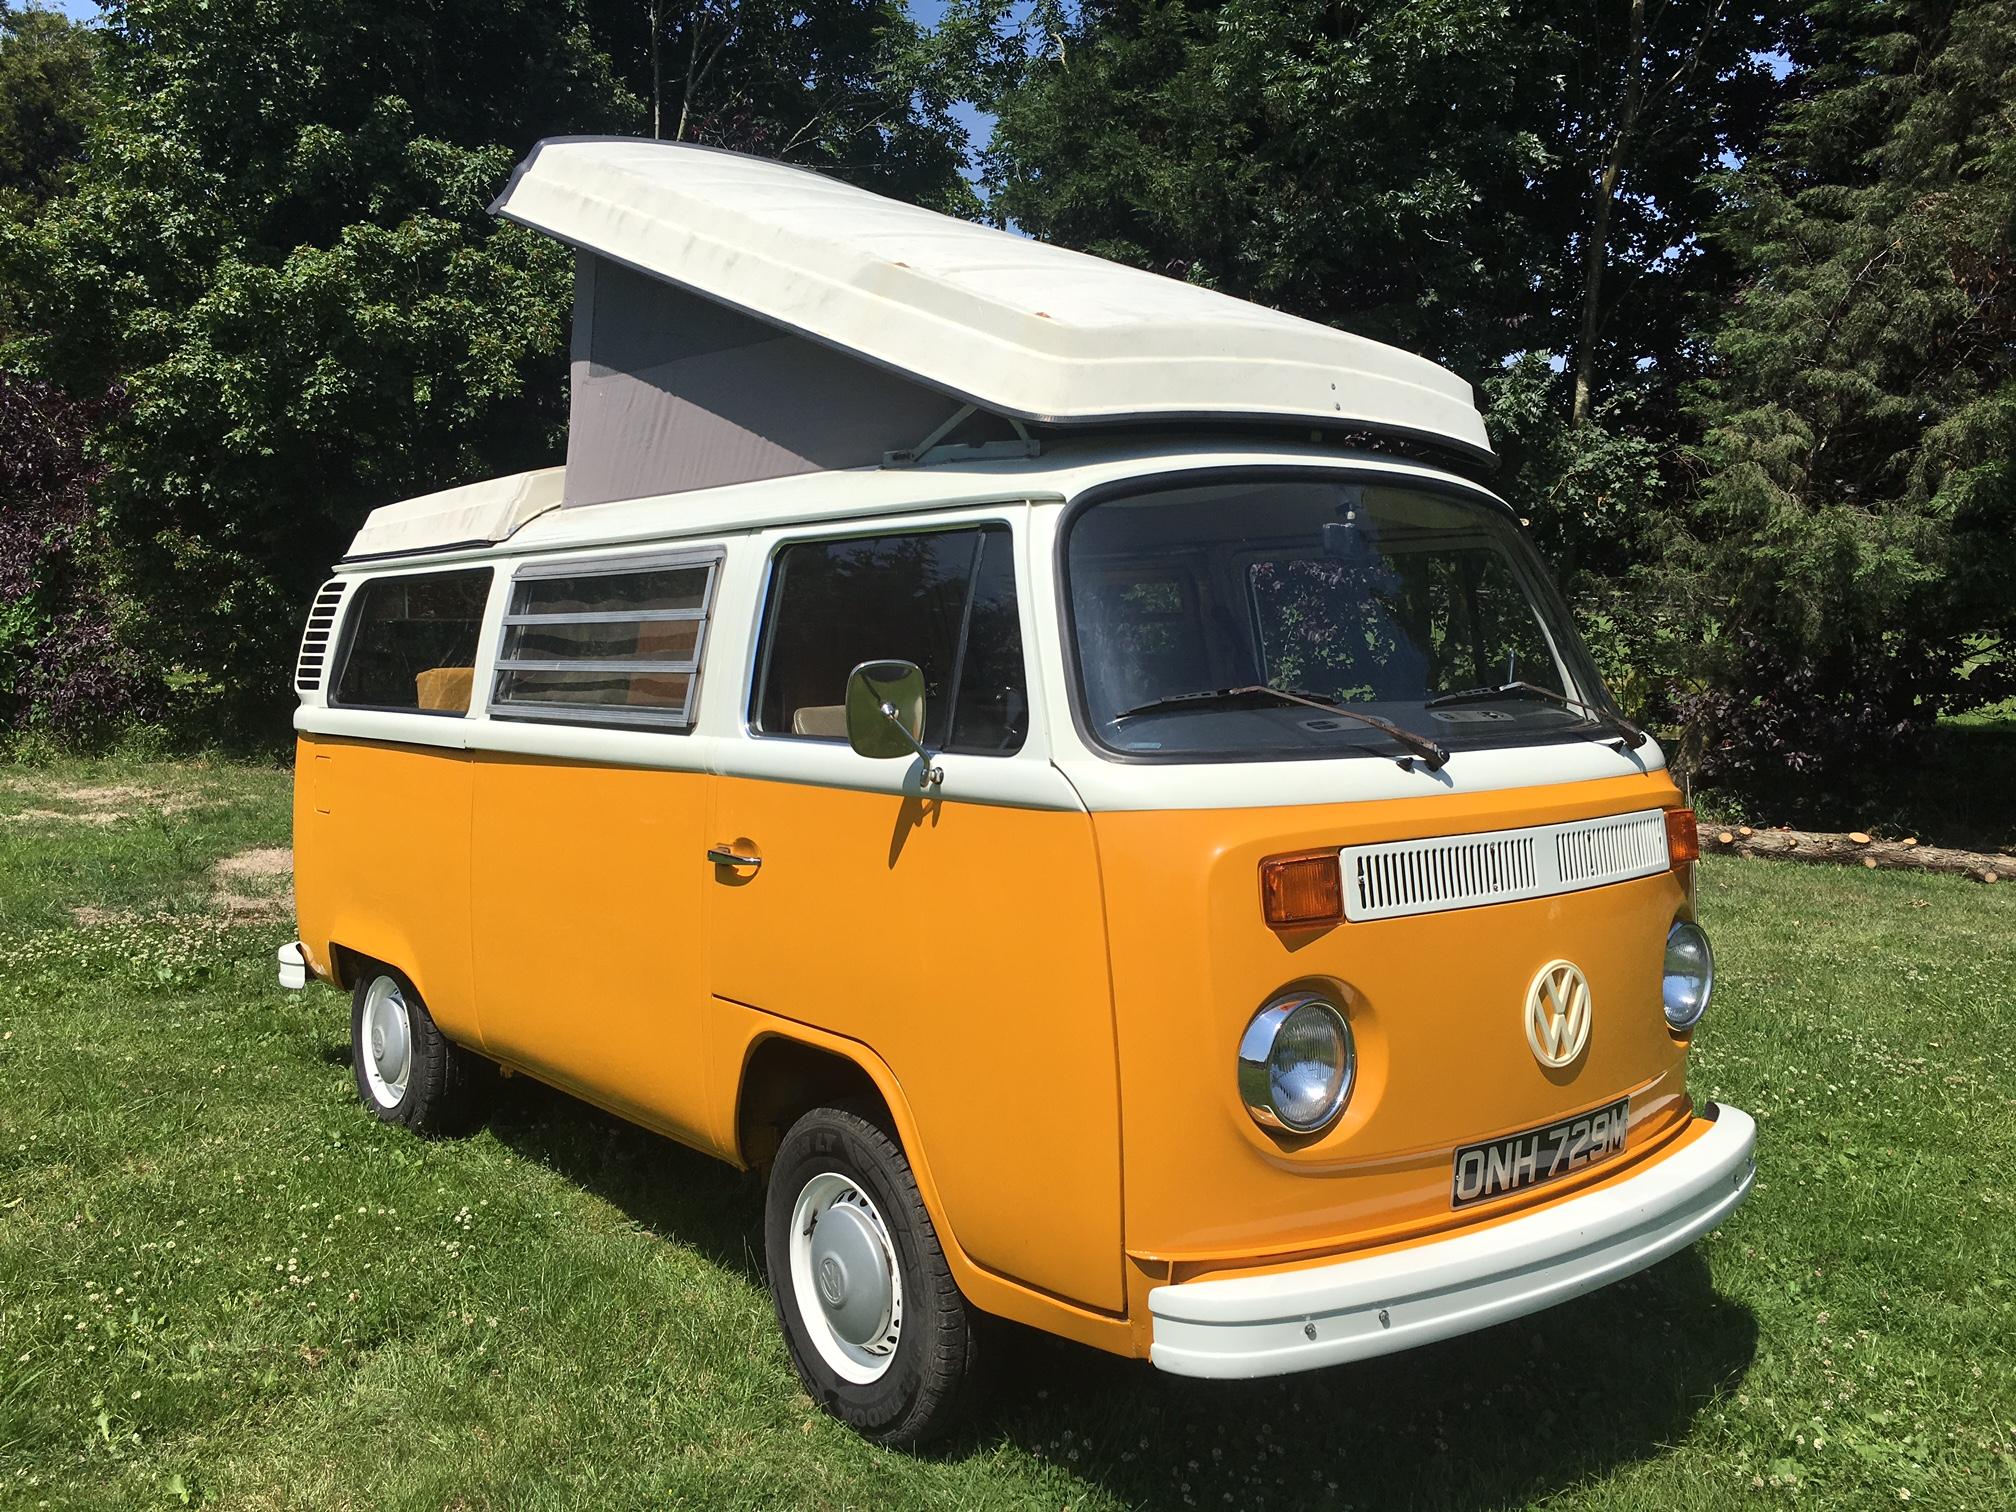 5-berth-westfalia-campervan-for-sale